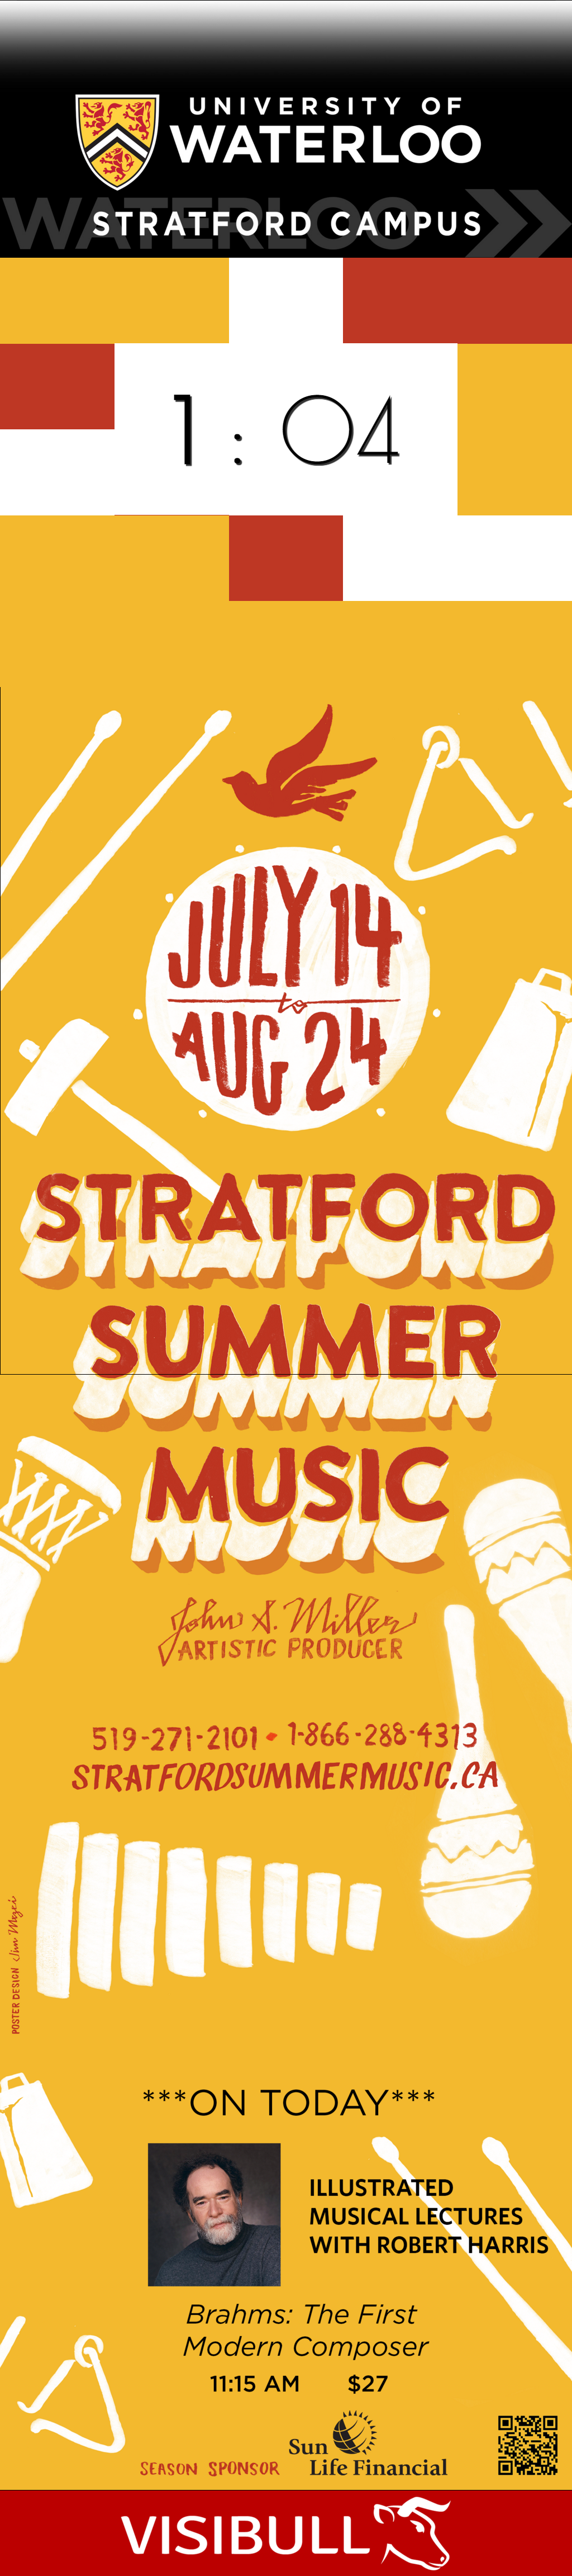 stratSummerMusic2014.png